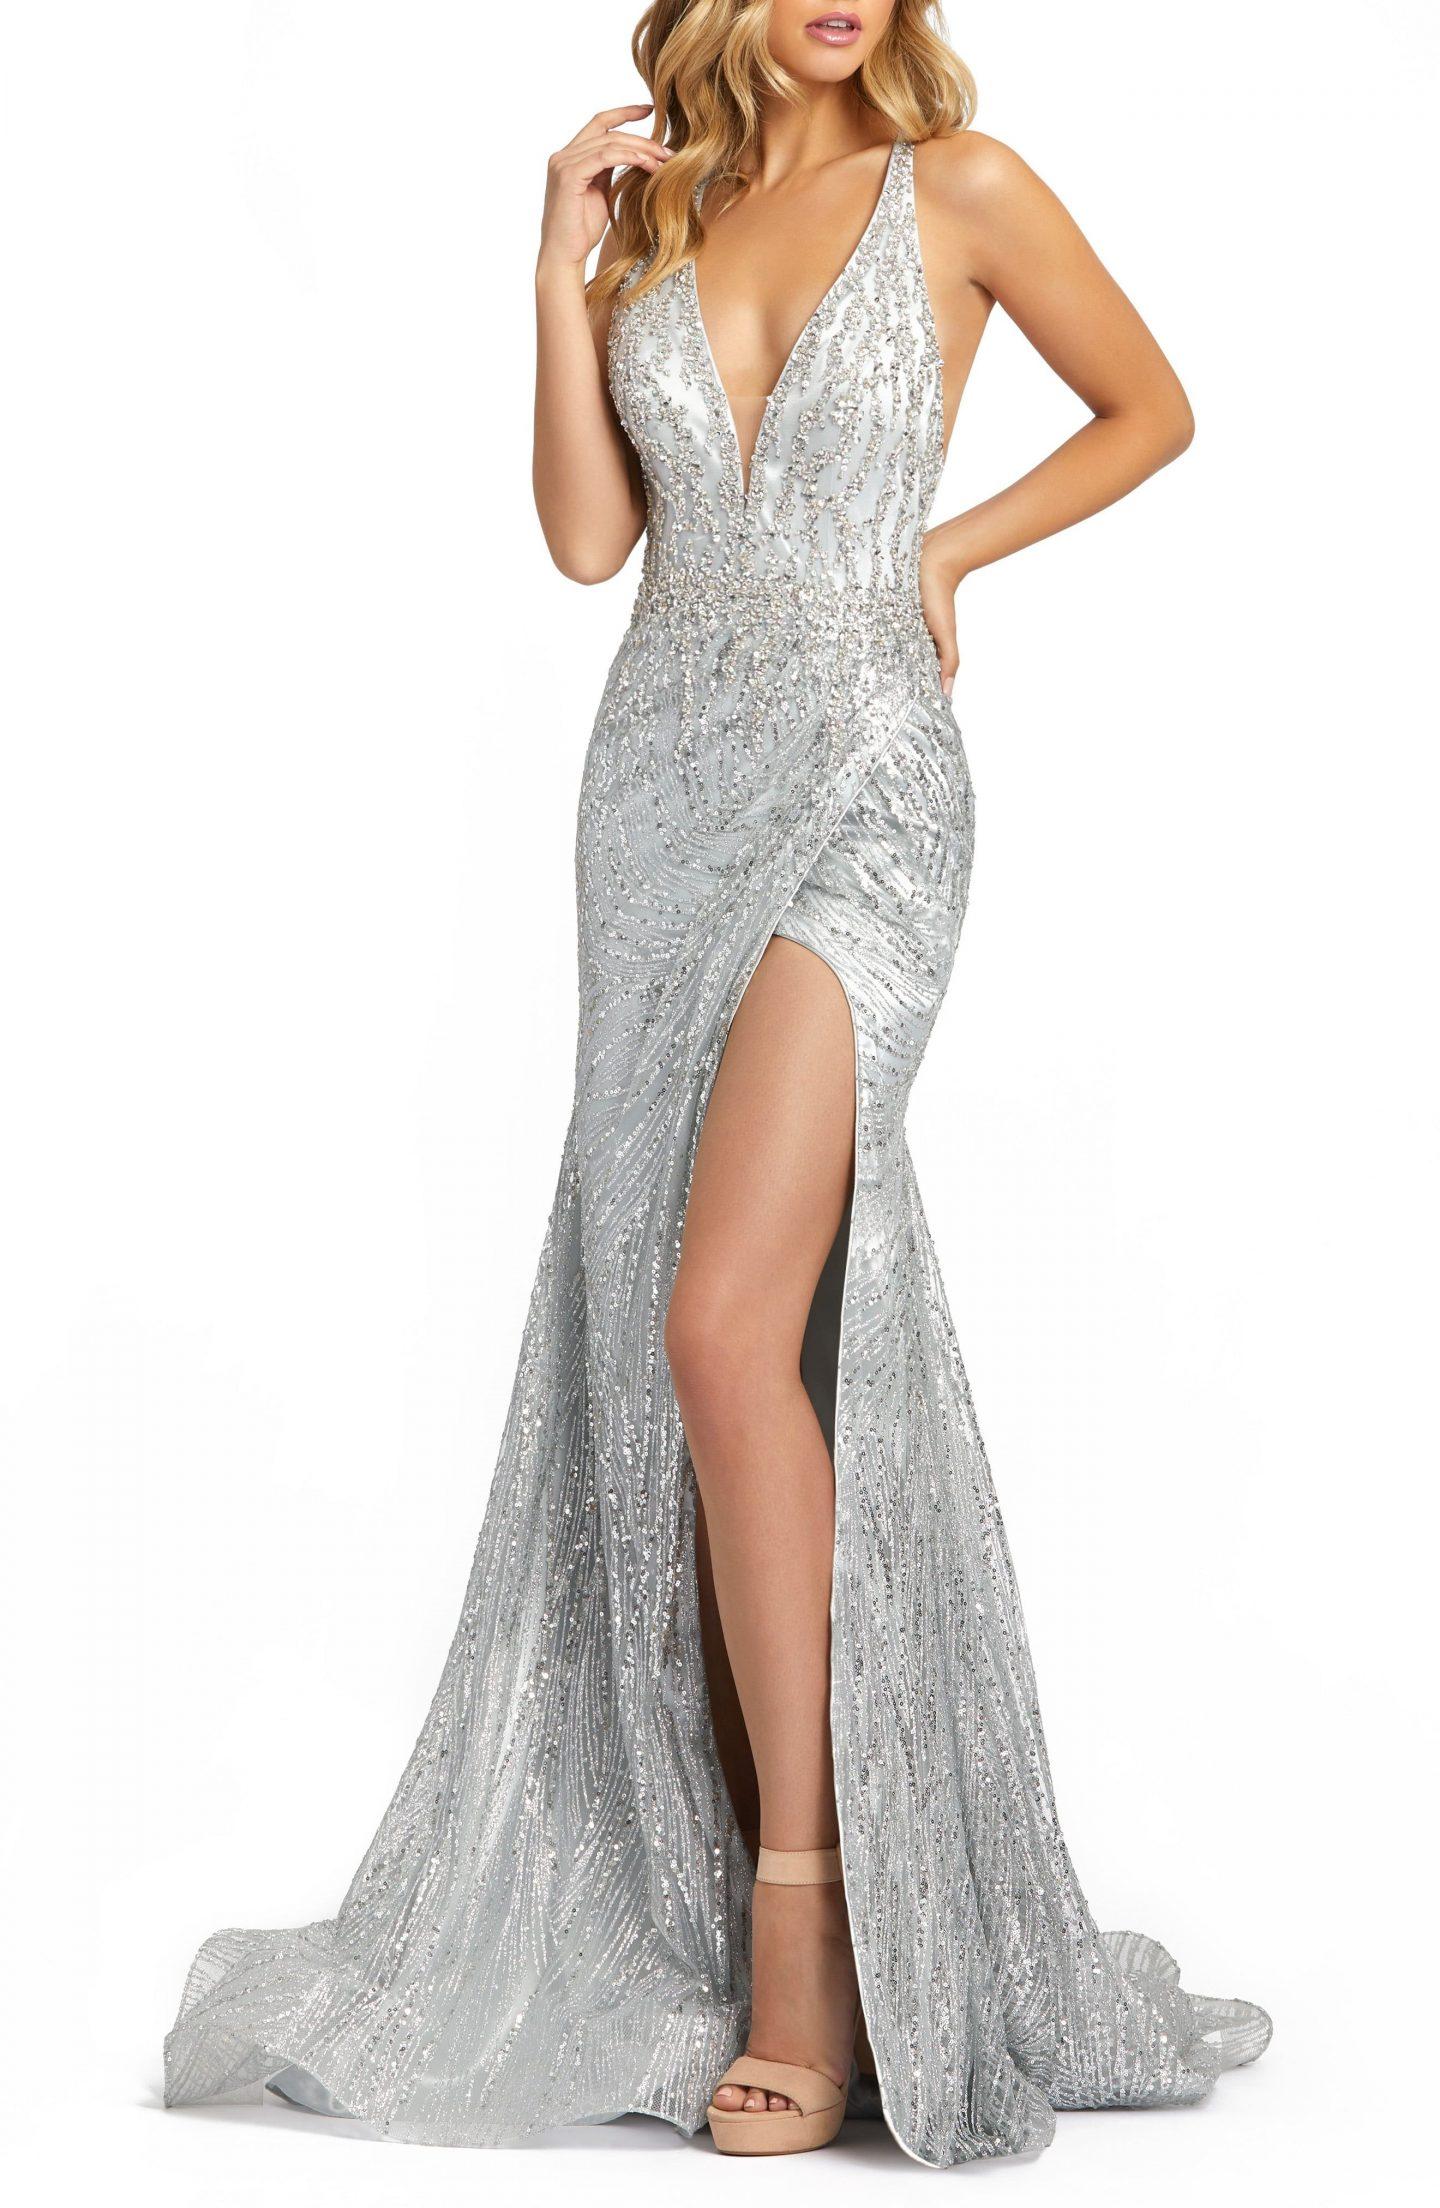 Silver beaded prom dress with split